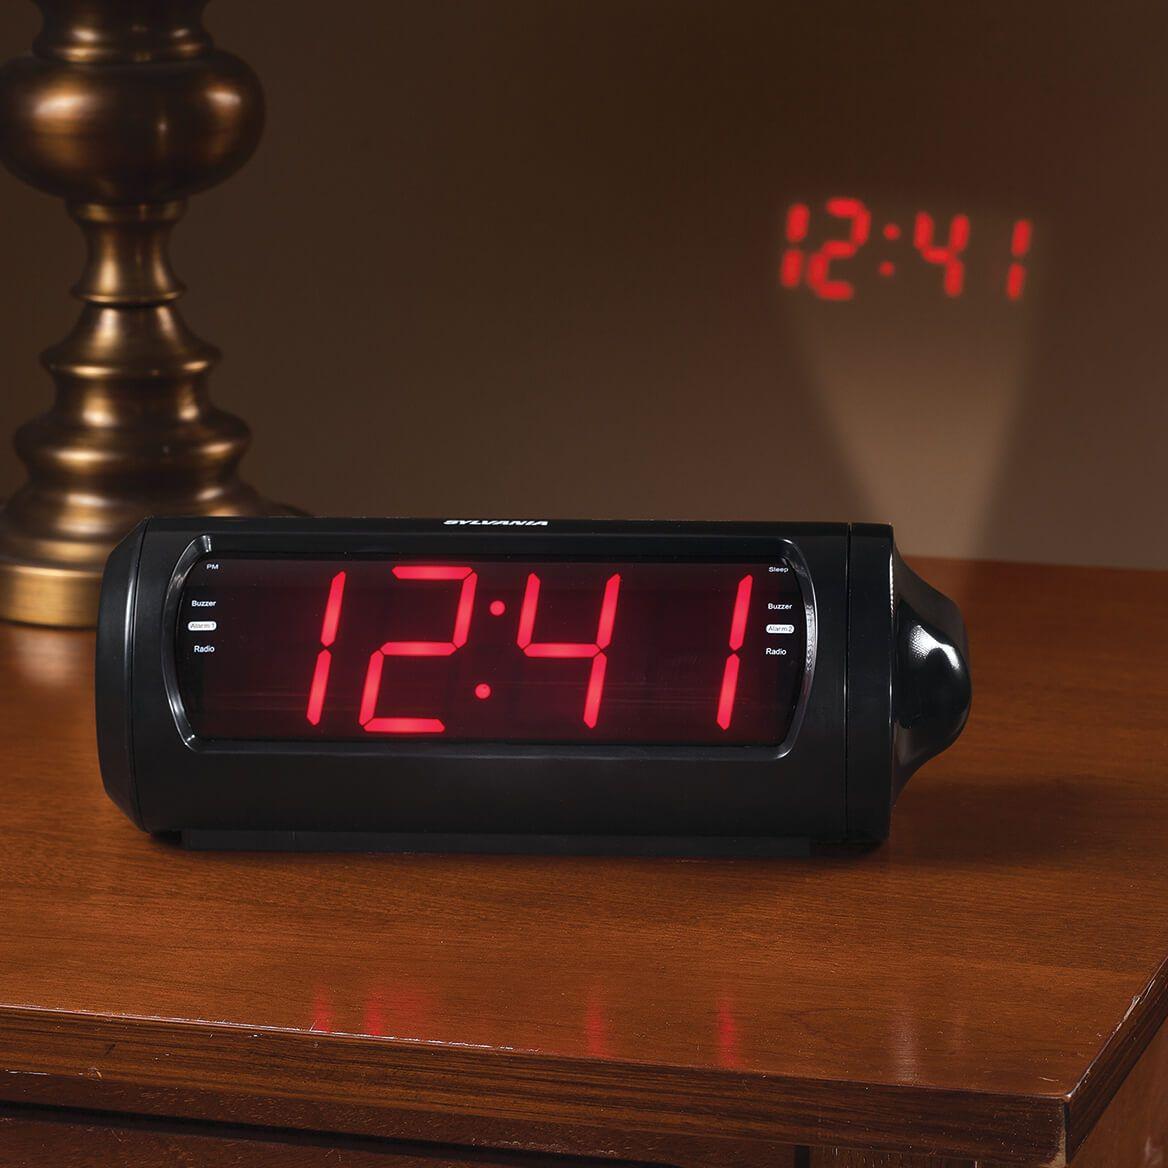 Jumbo Digit Projection Clock Radio - USB Charging-363325